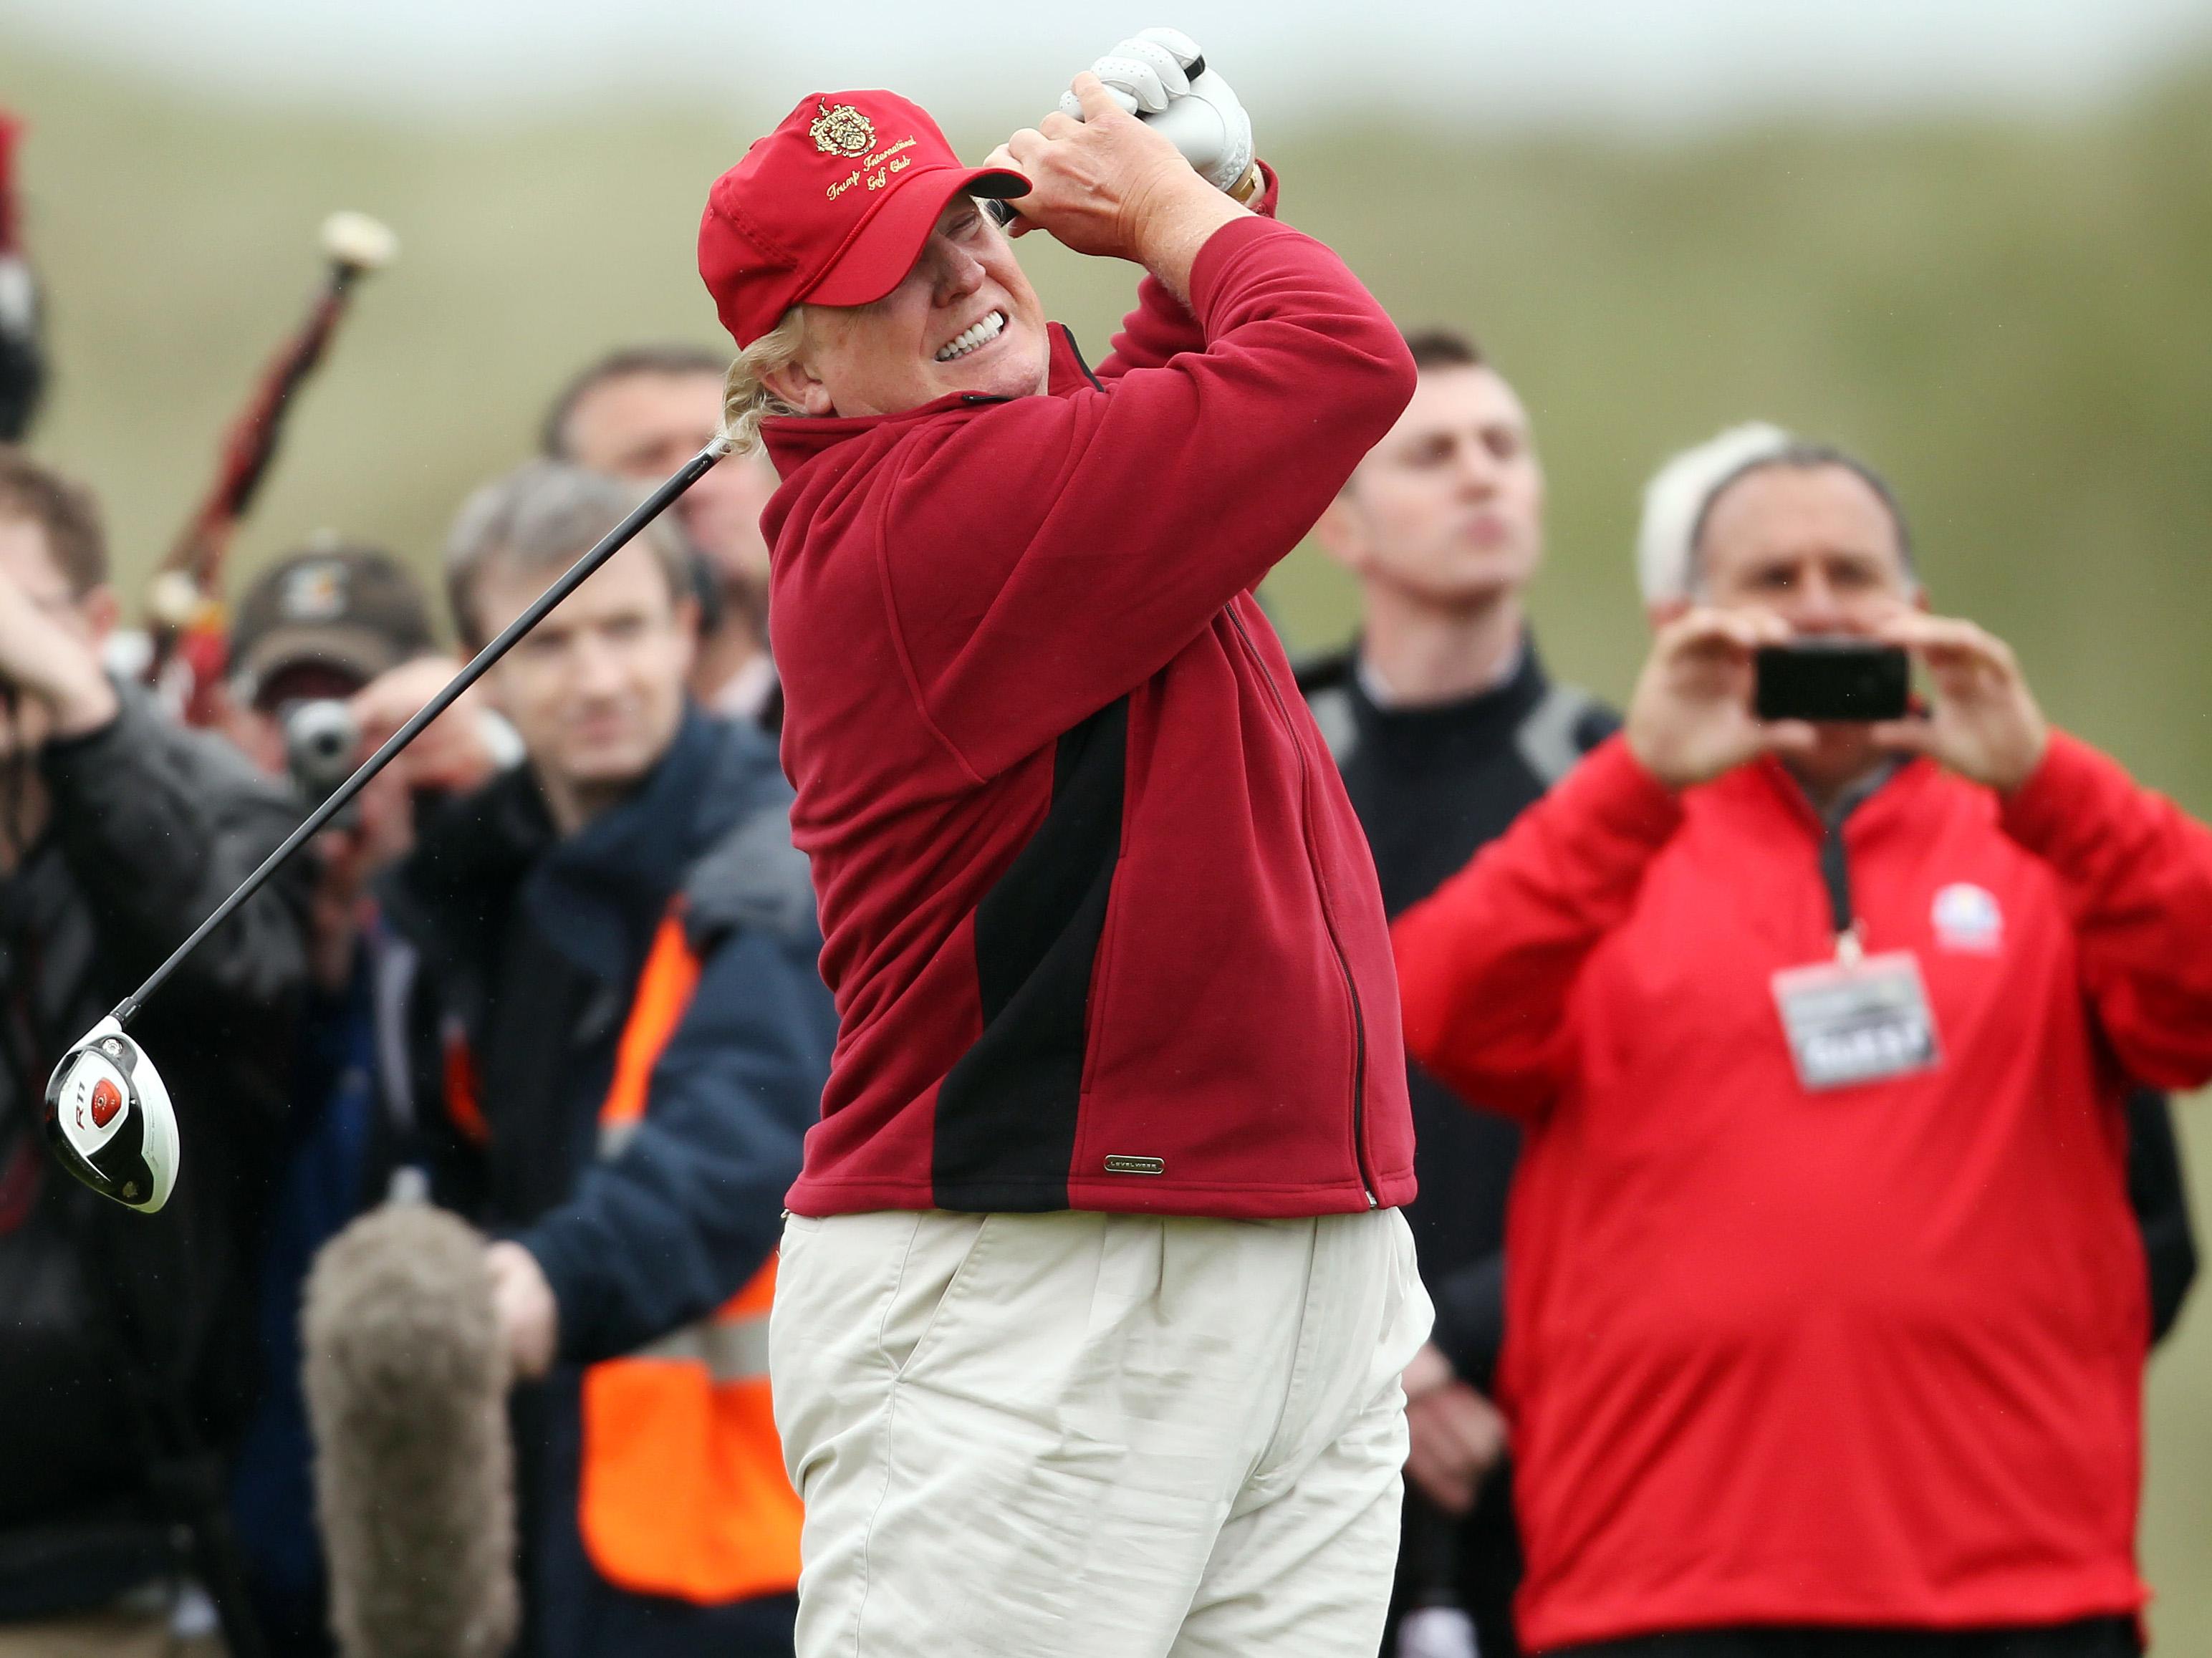 Trump posts video of golf swing